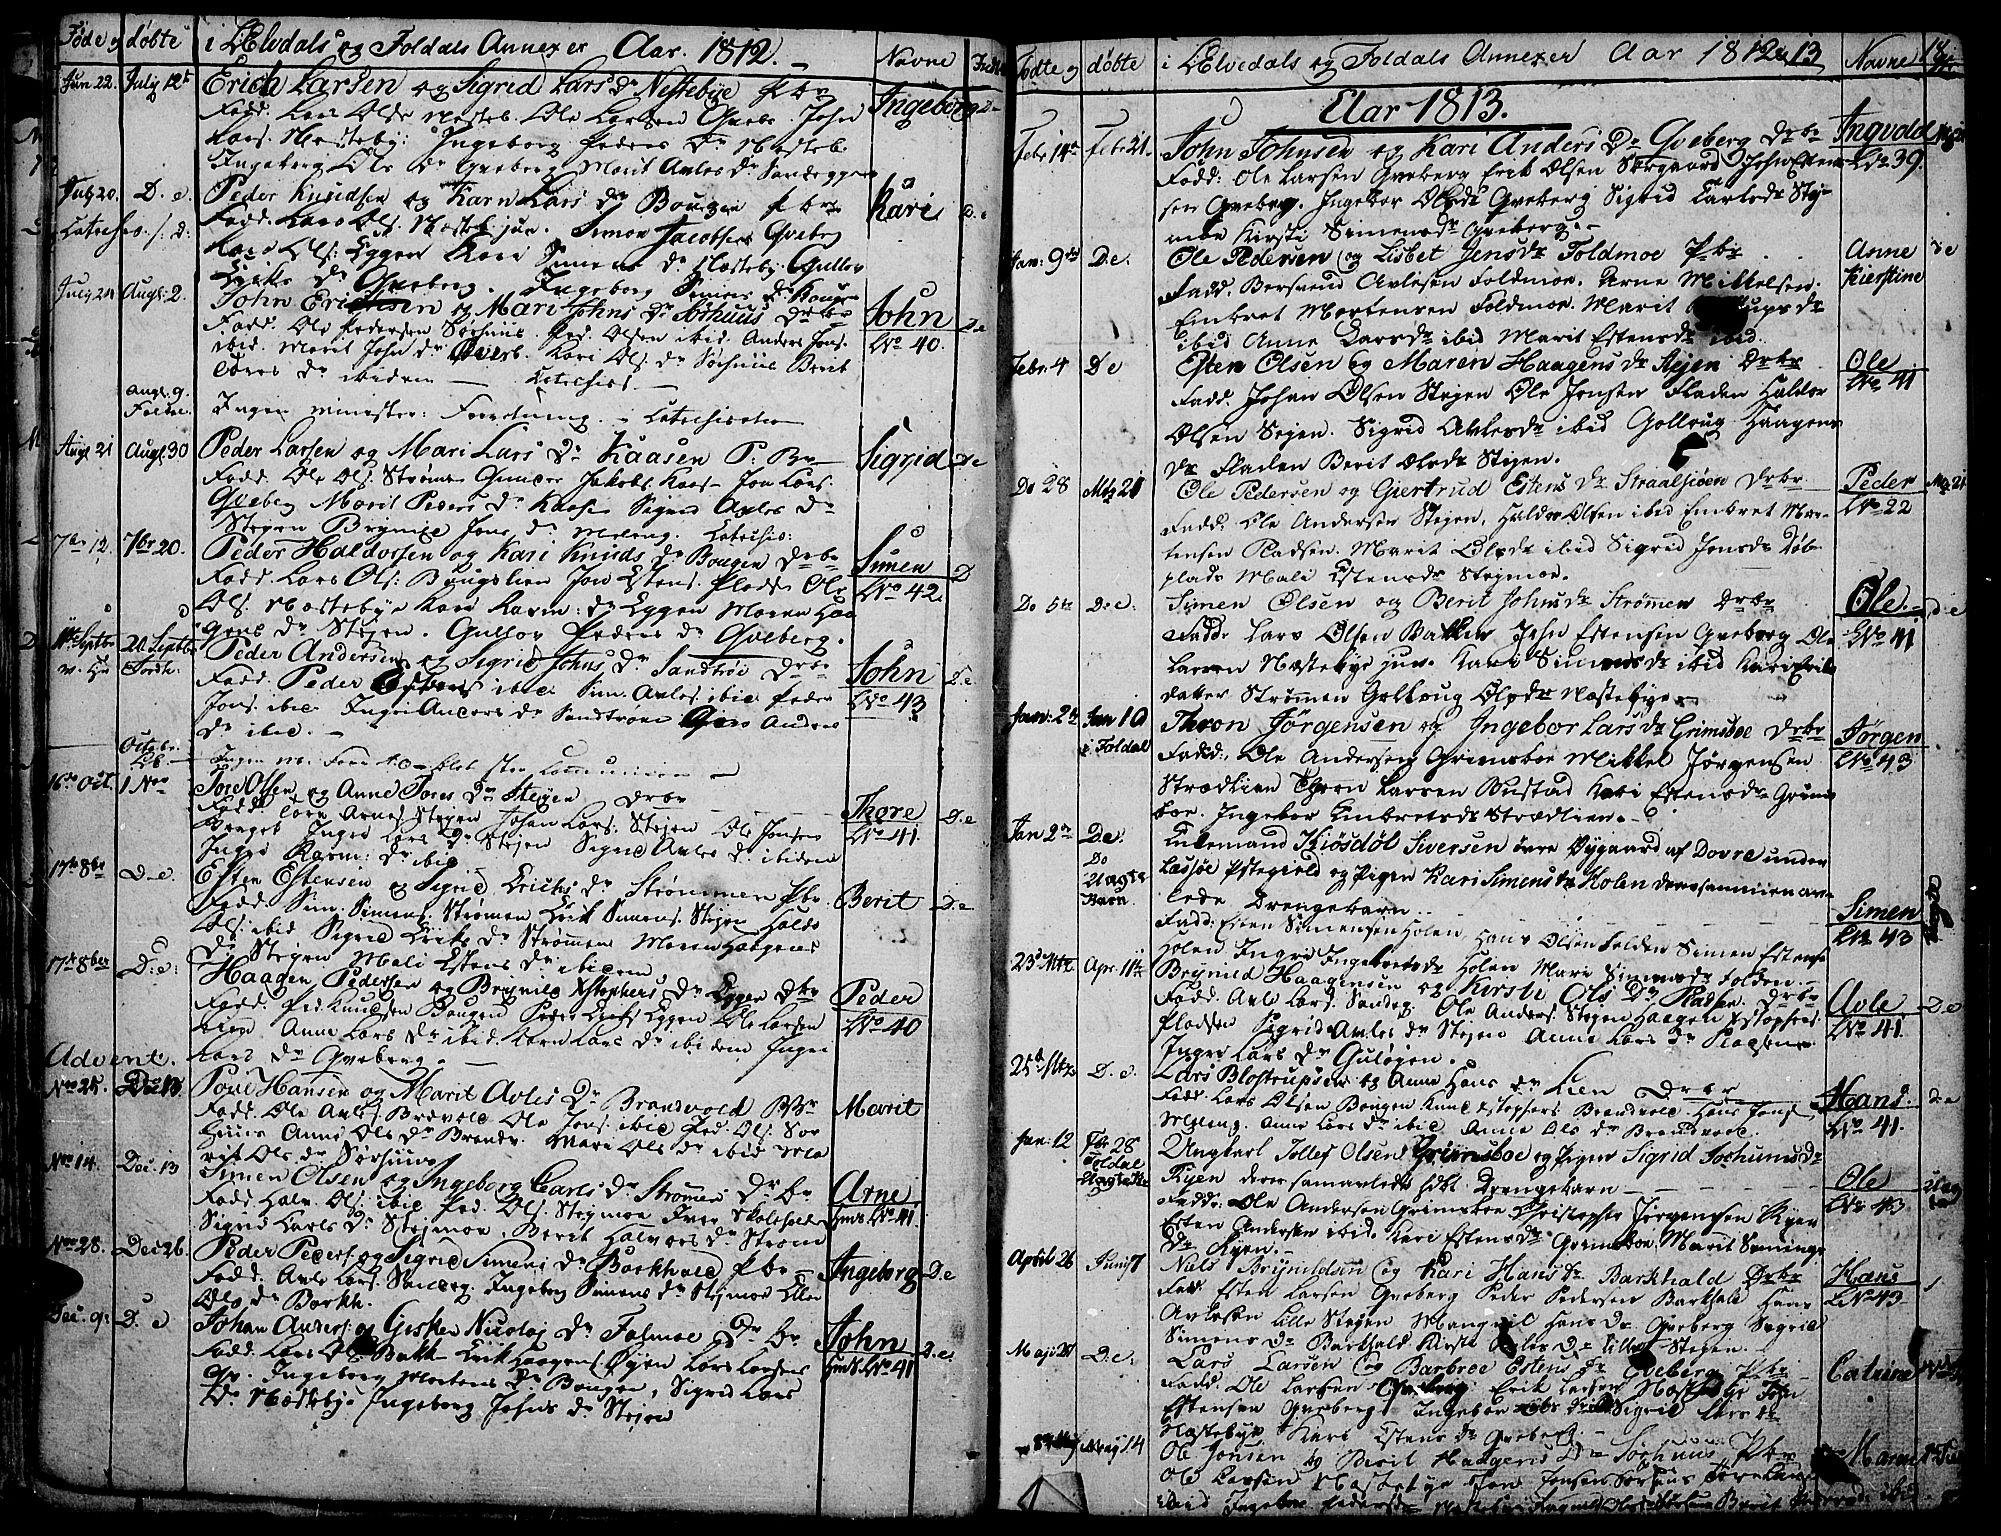 SAH, Tynset prestekontor, Ministerialbok nr. 16, 1801-1814, s. 18